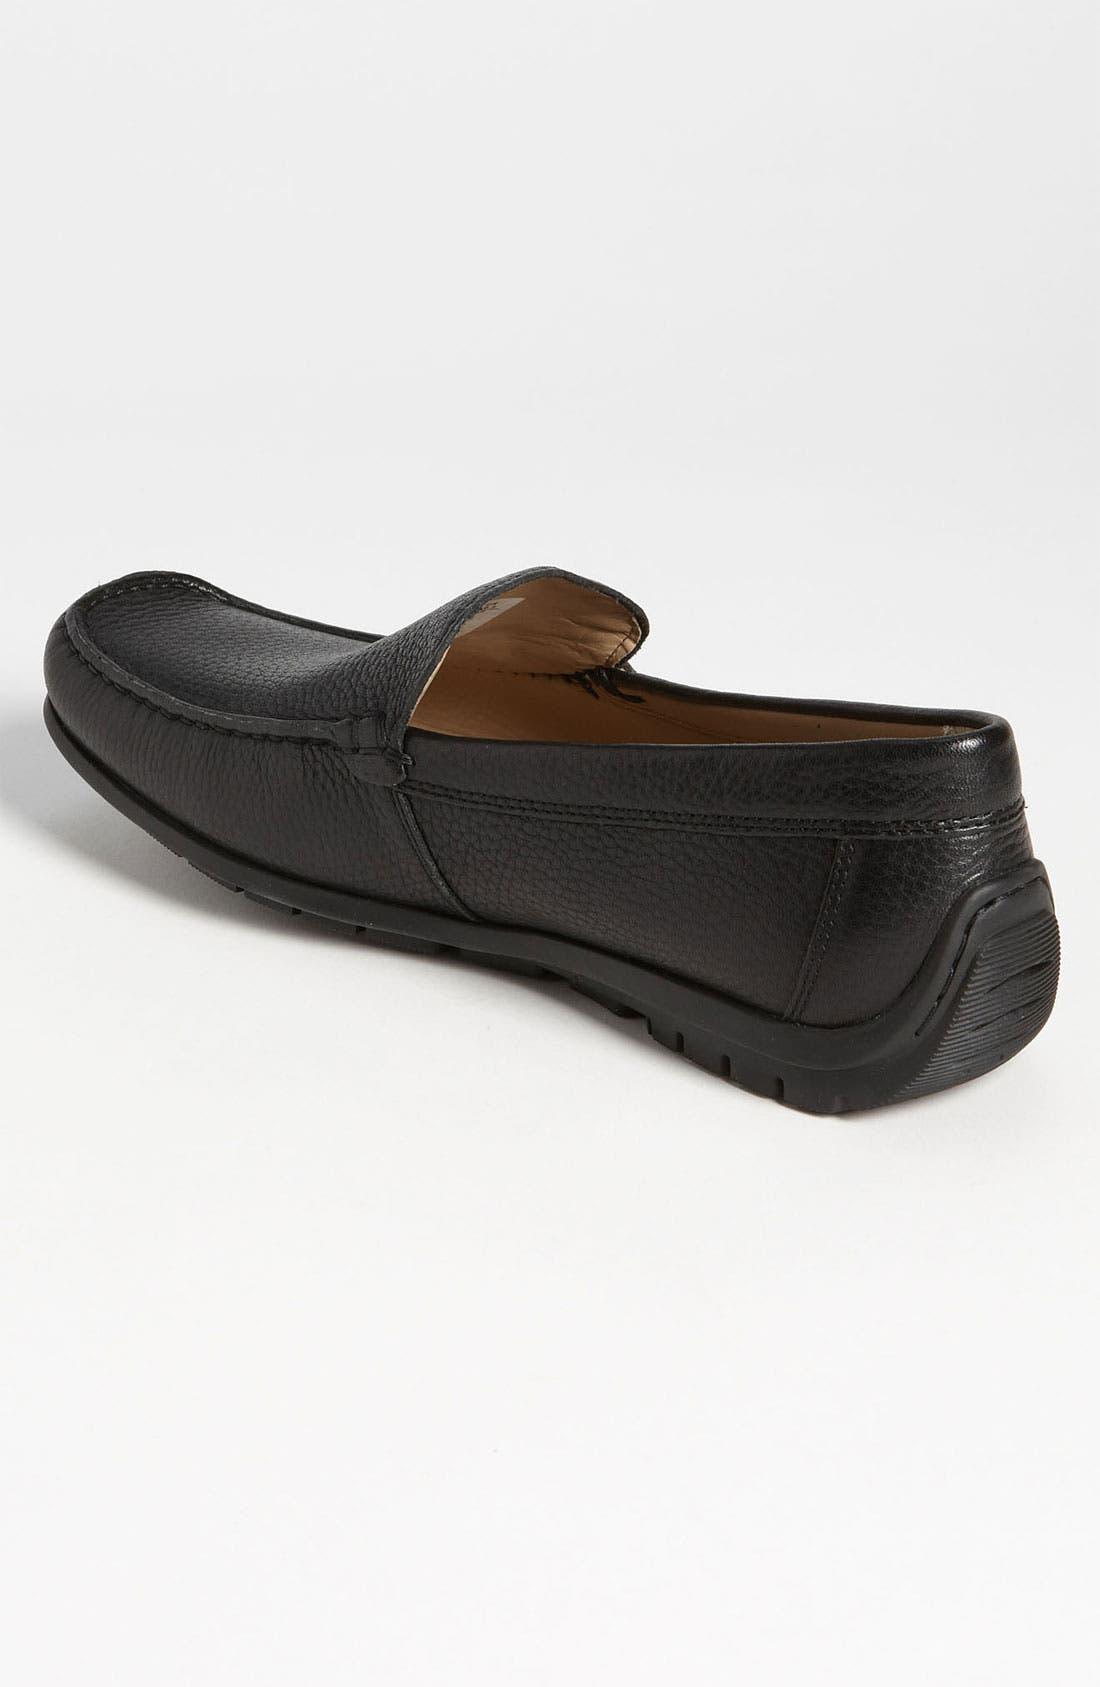 Alternate Image 2  - ECCO 'Soft' Driving Shoe (Men)